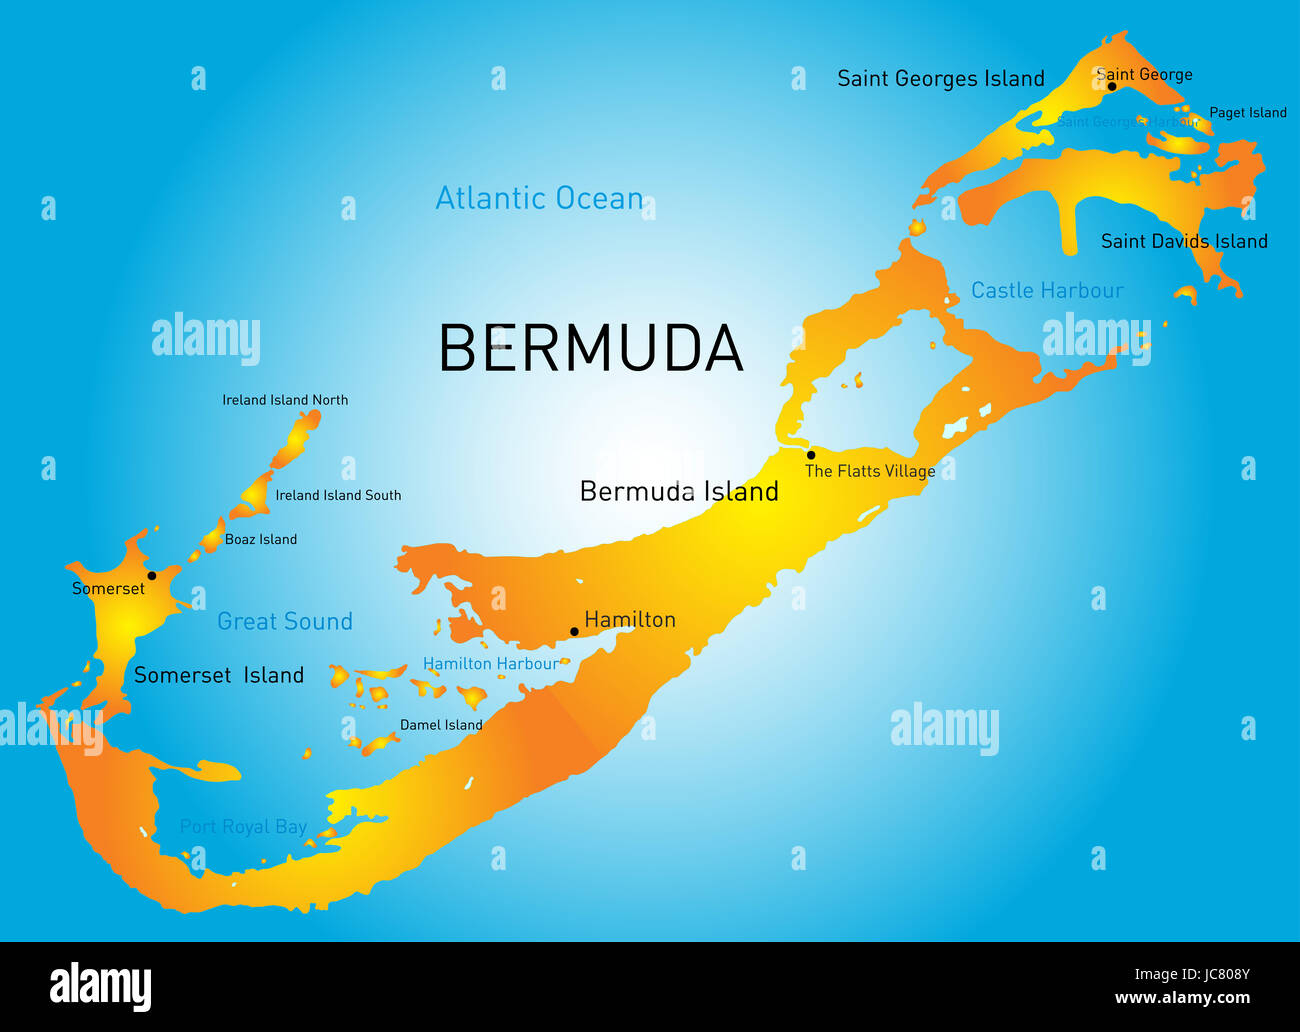 Map Of Bermuda Stockfotos & Map Of Bermuda Bilder - Alamy